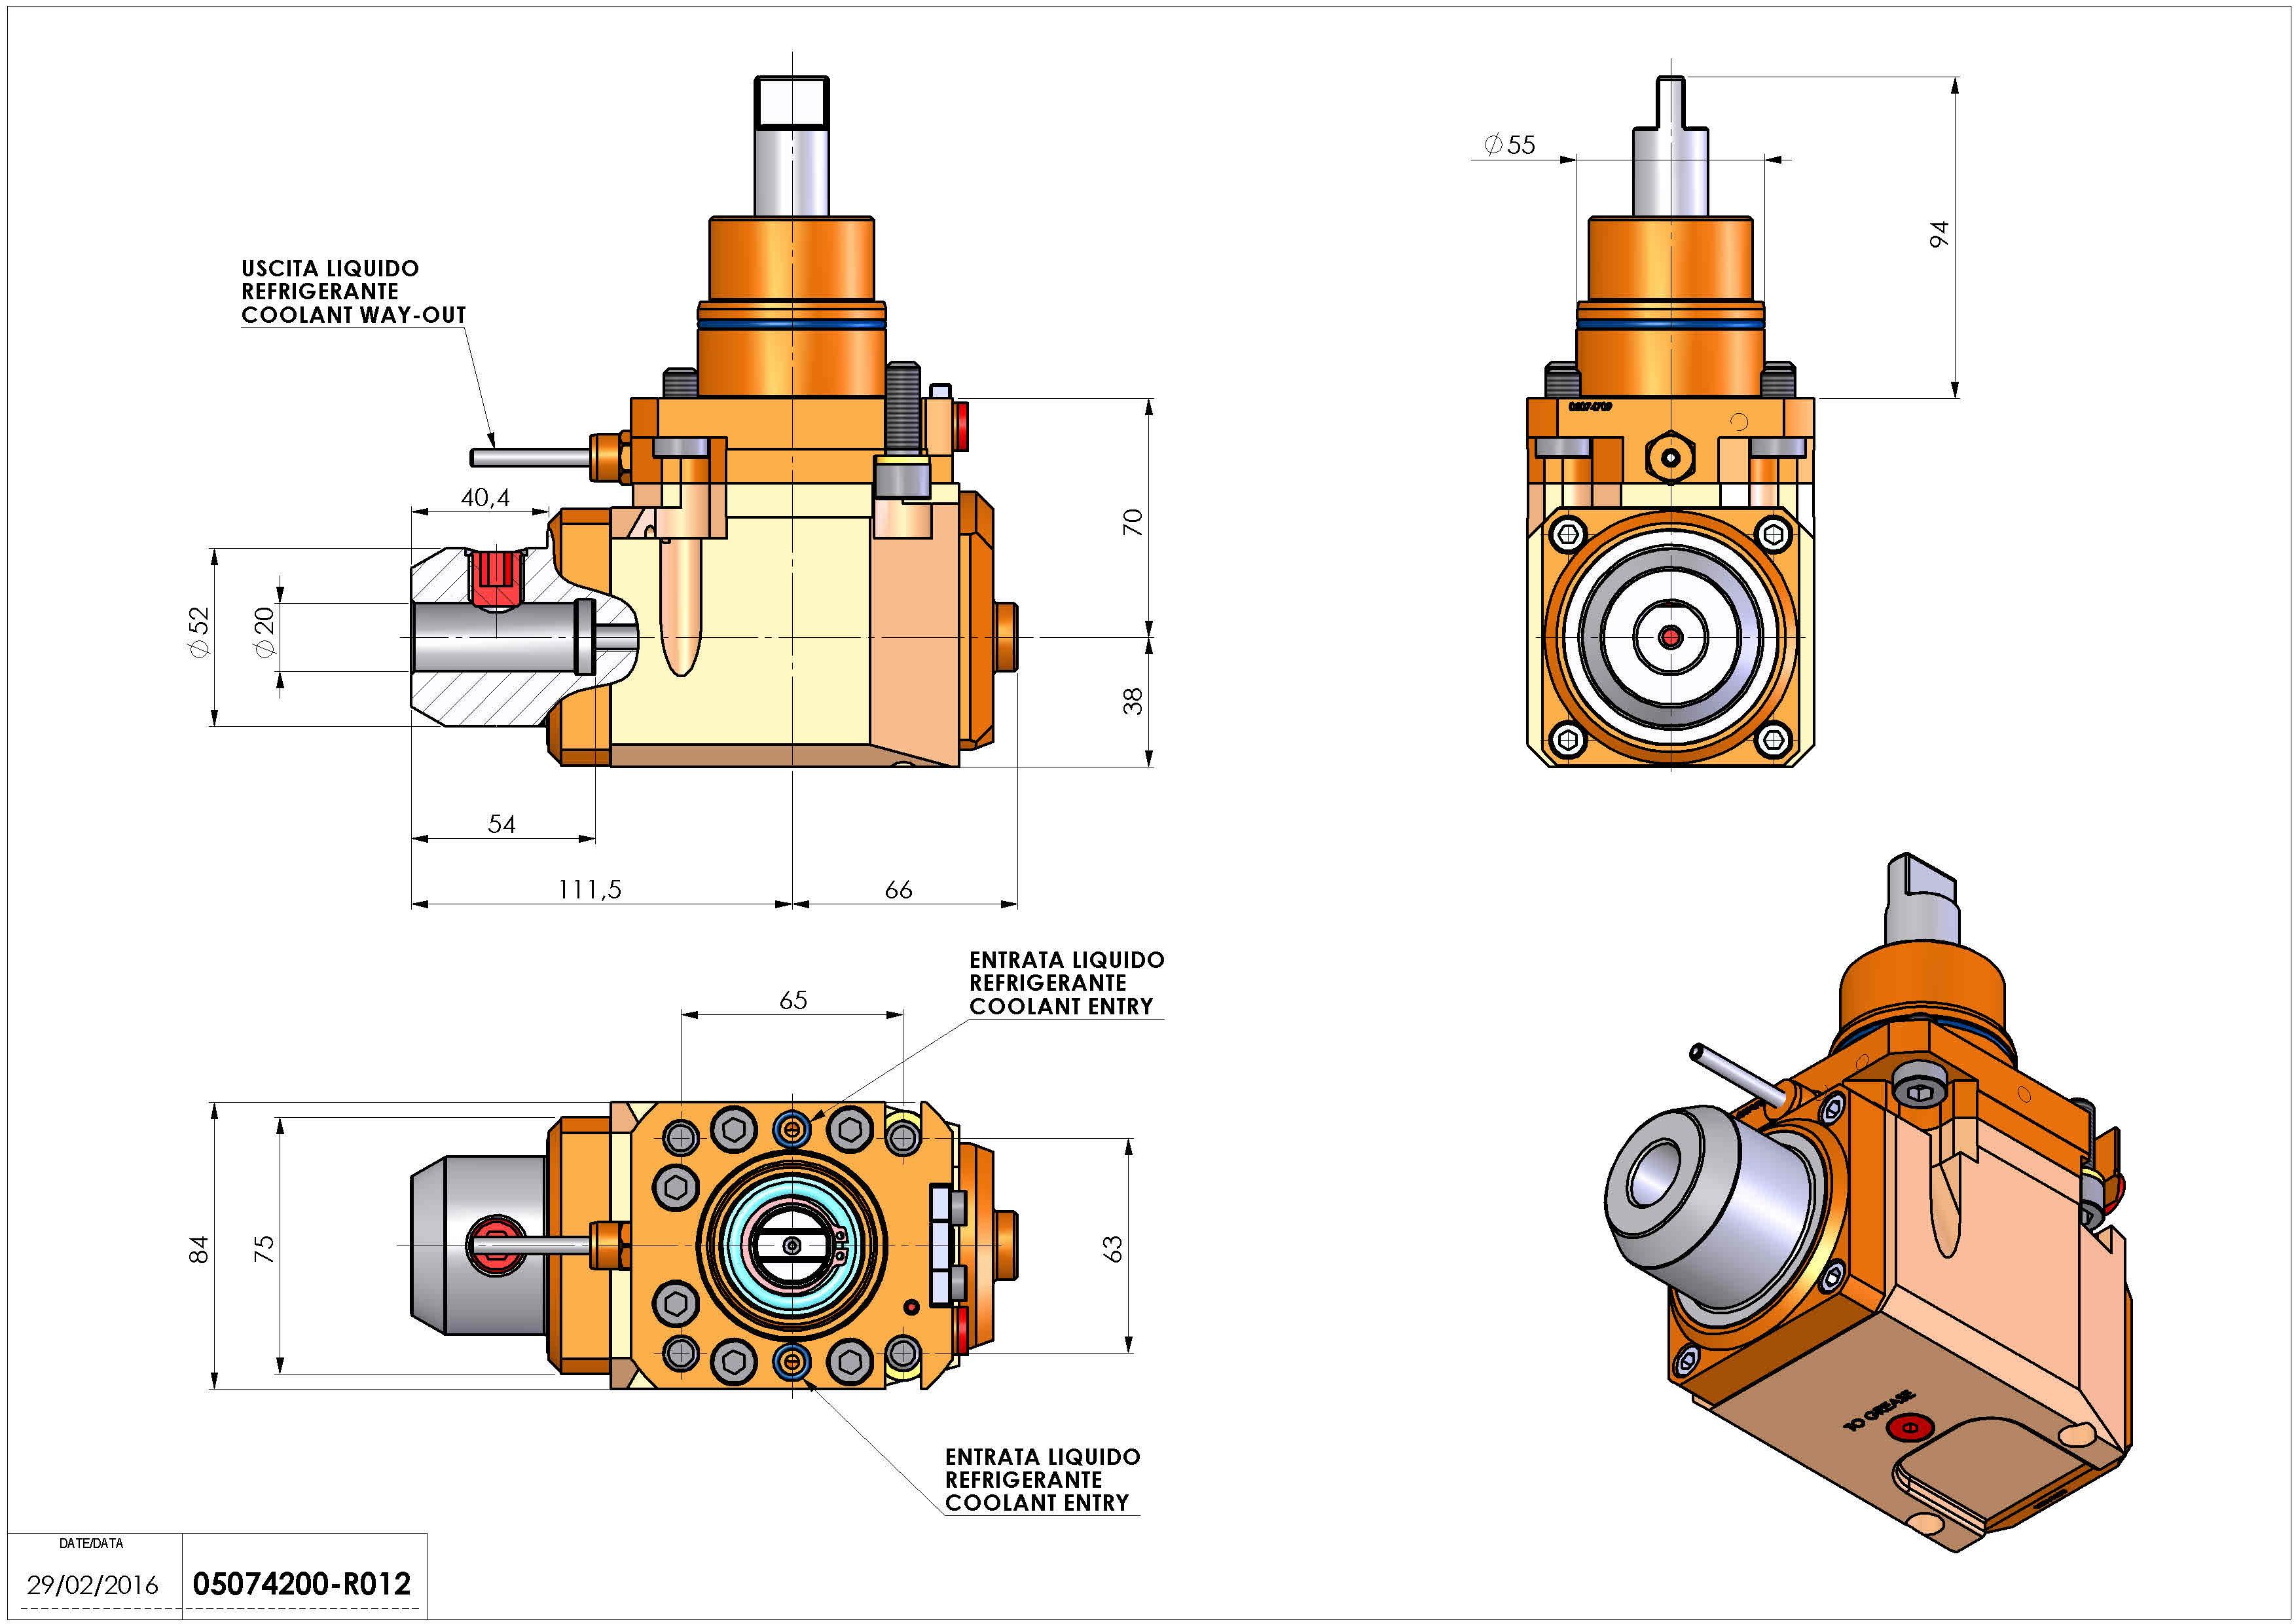 Technical image - LT-A D55 WELDON-20 LR H70 BI.